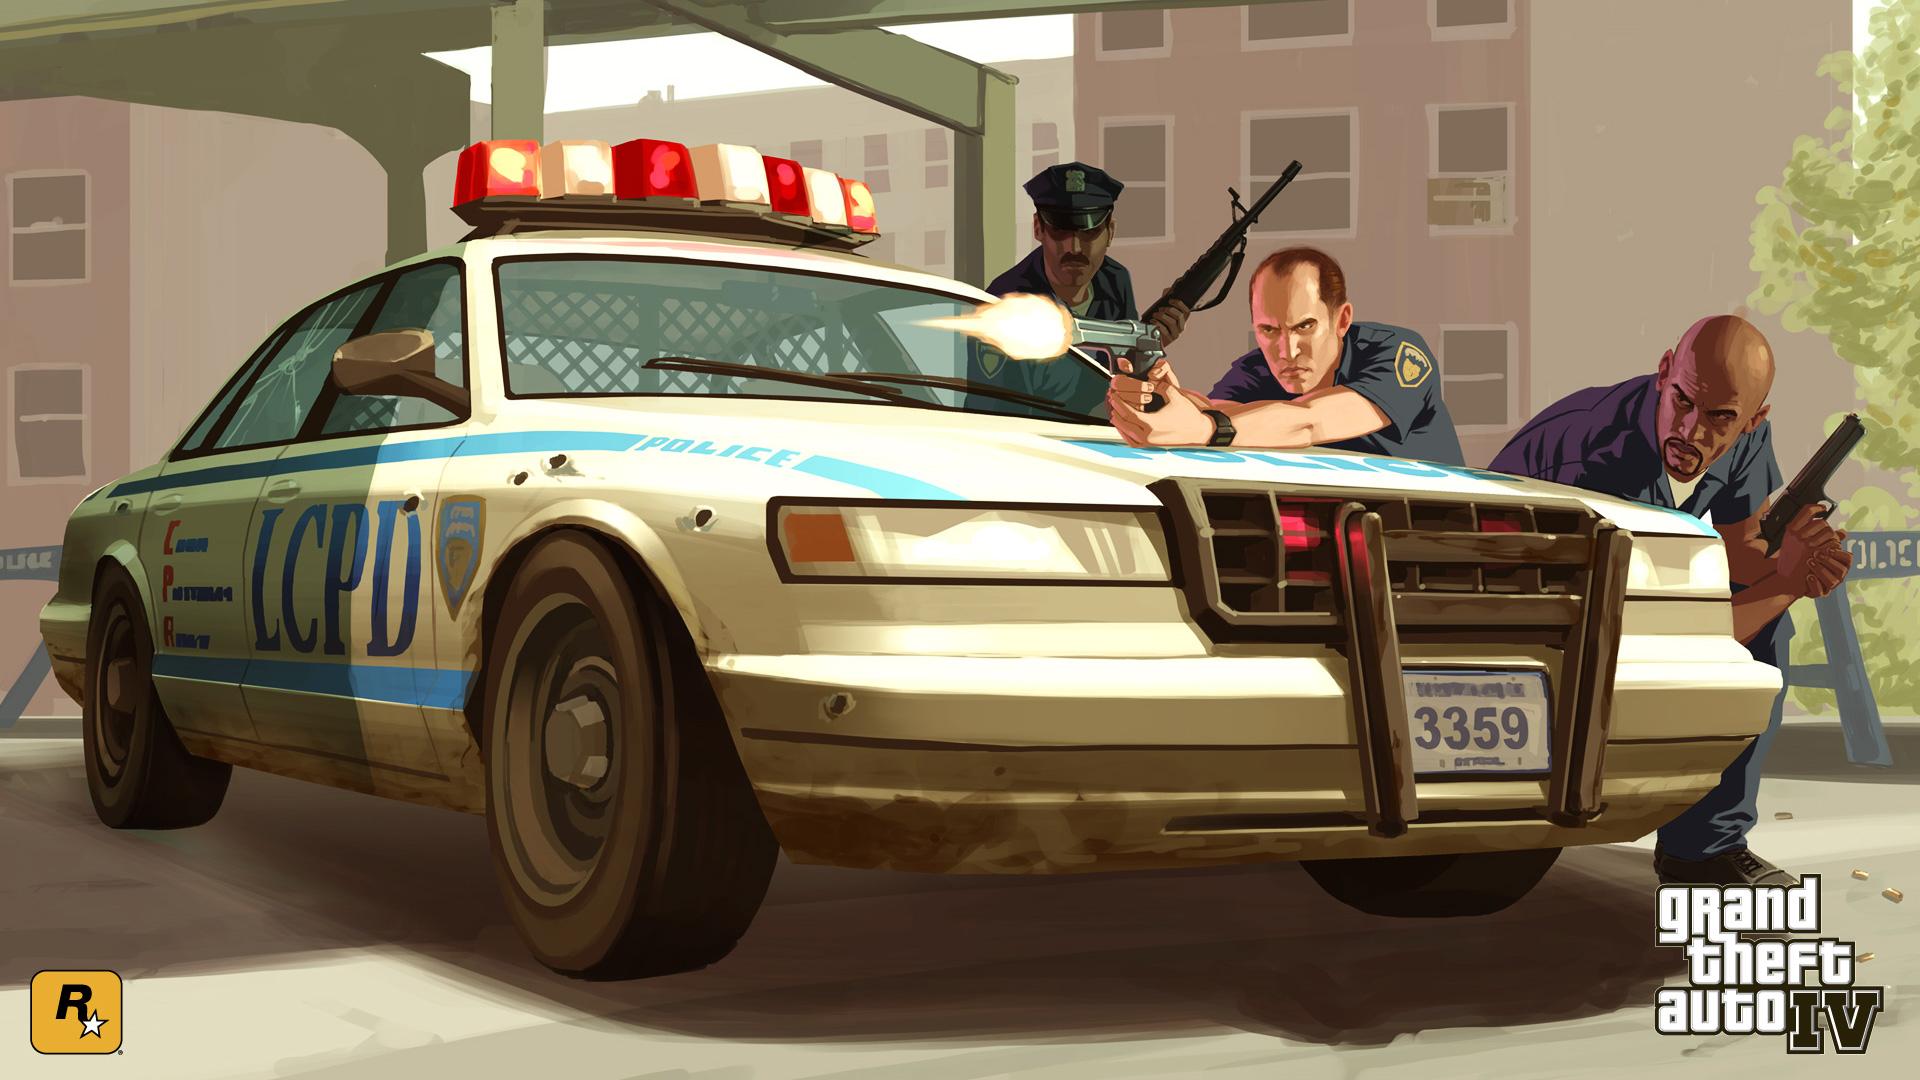 Grand Theft Auto IV Wallpaper in 1920x1080